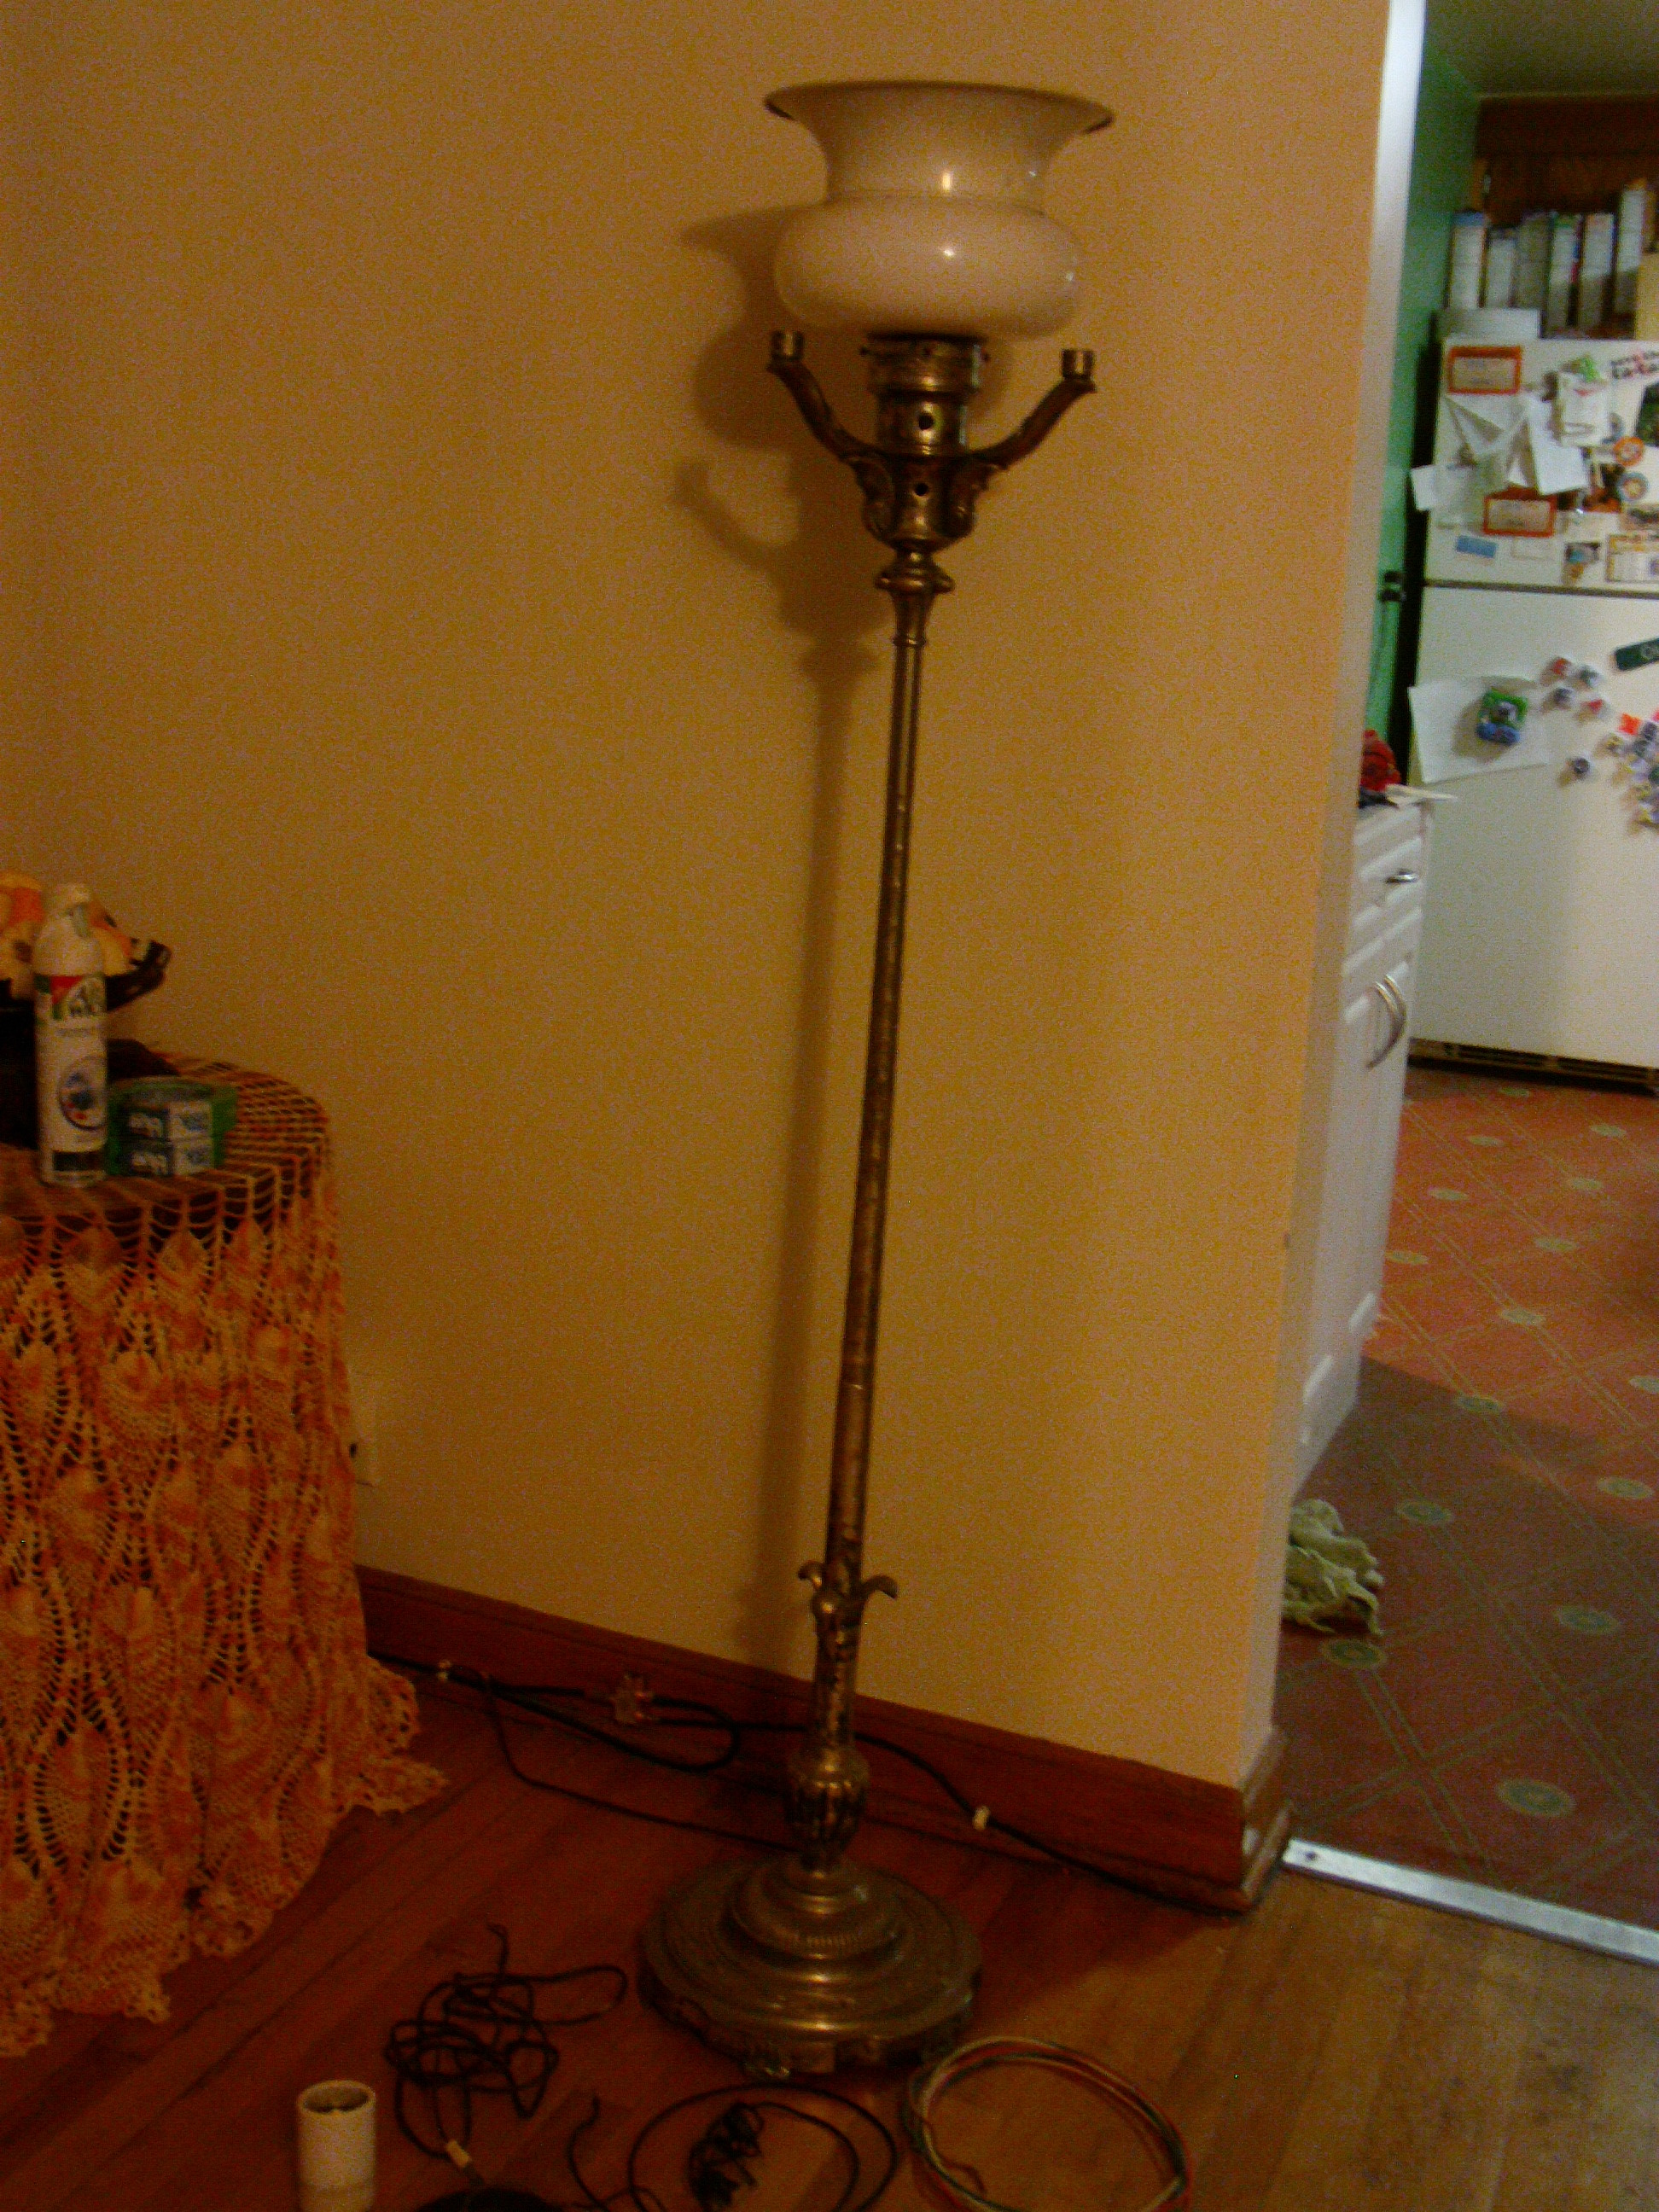 Colonial premier certifed floor lamp antique appraisal instappraisal colonial premier certifed floor lamp aloadofball Images